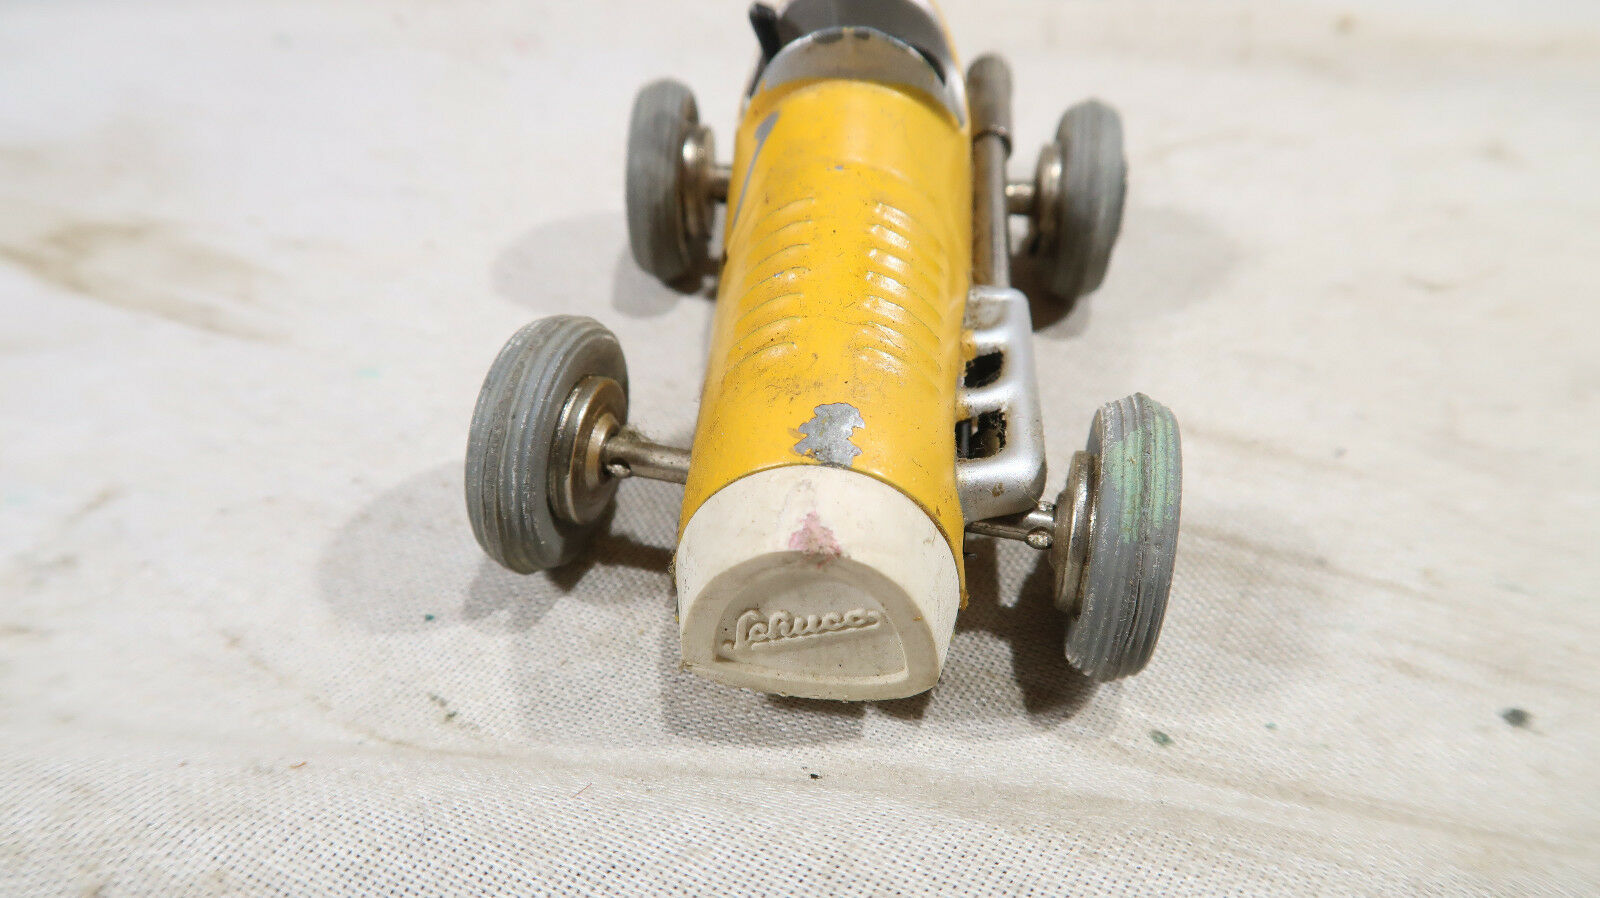 Schuco Micro Micro Micro Racer Model 1042 Key Wind Up 3401df